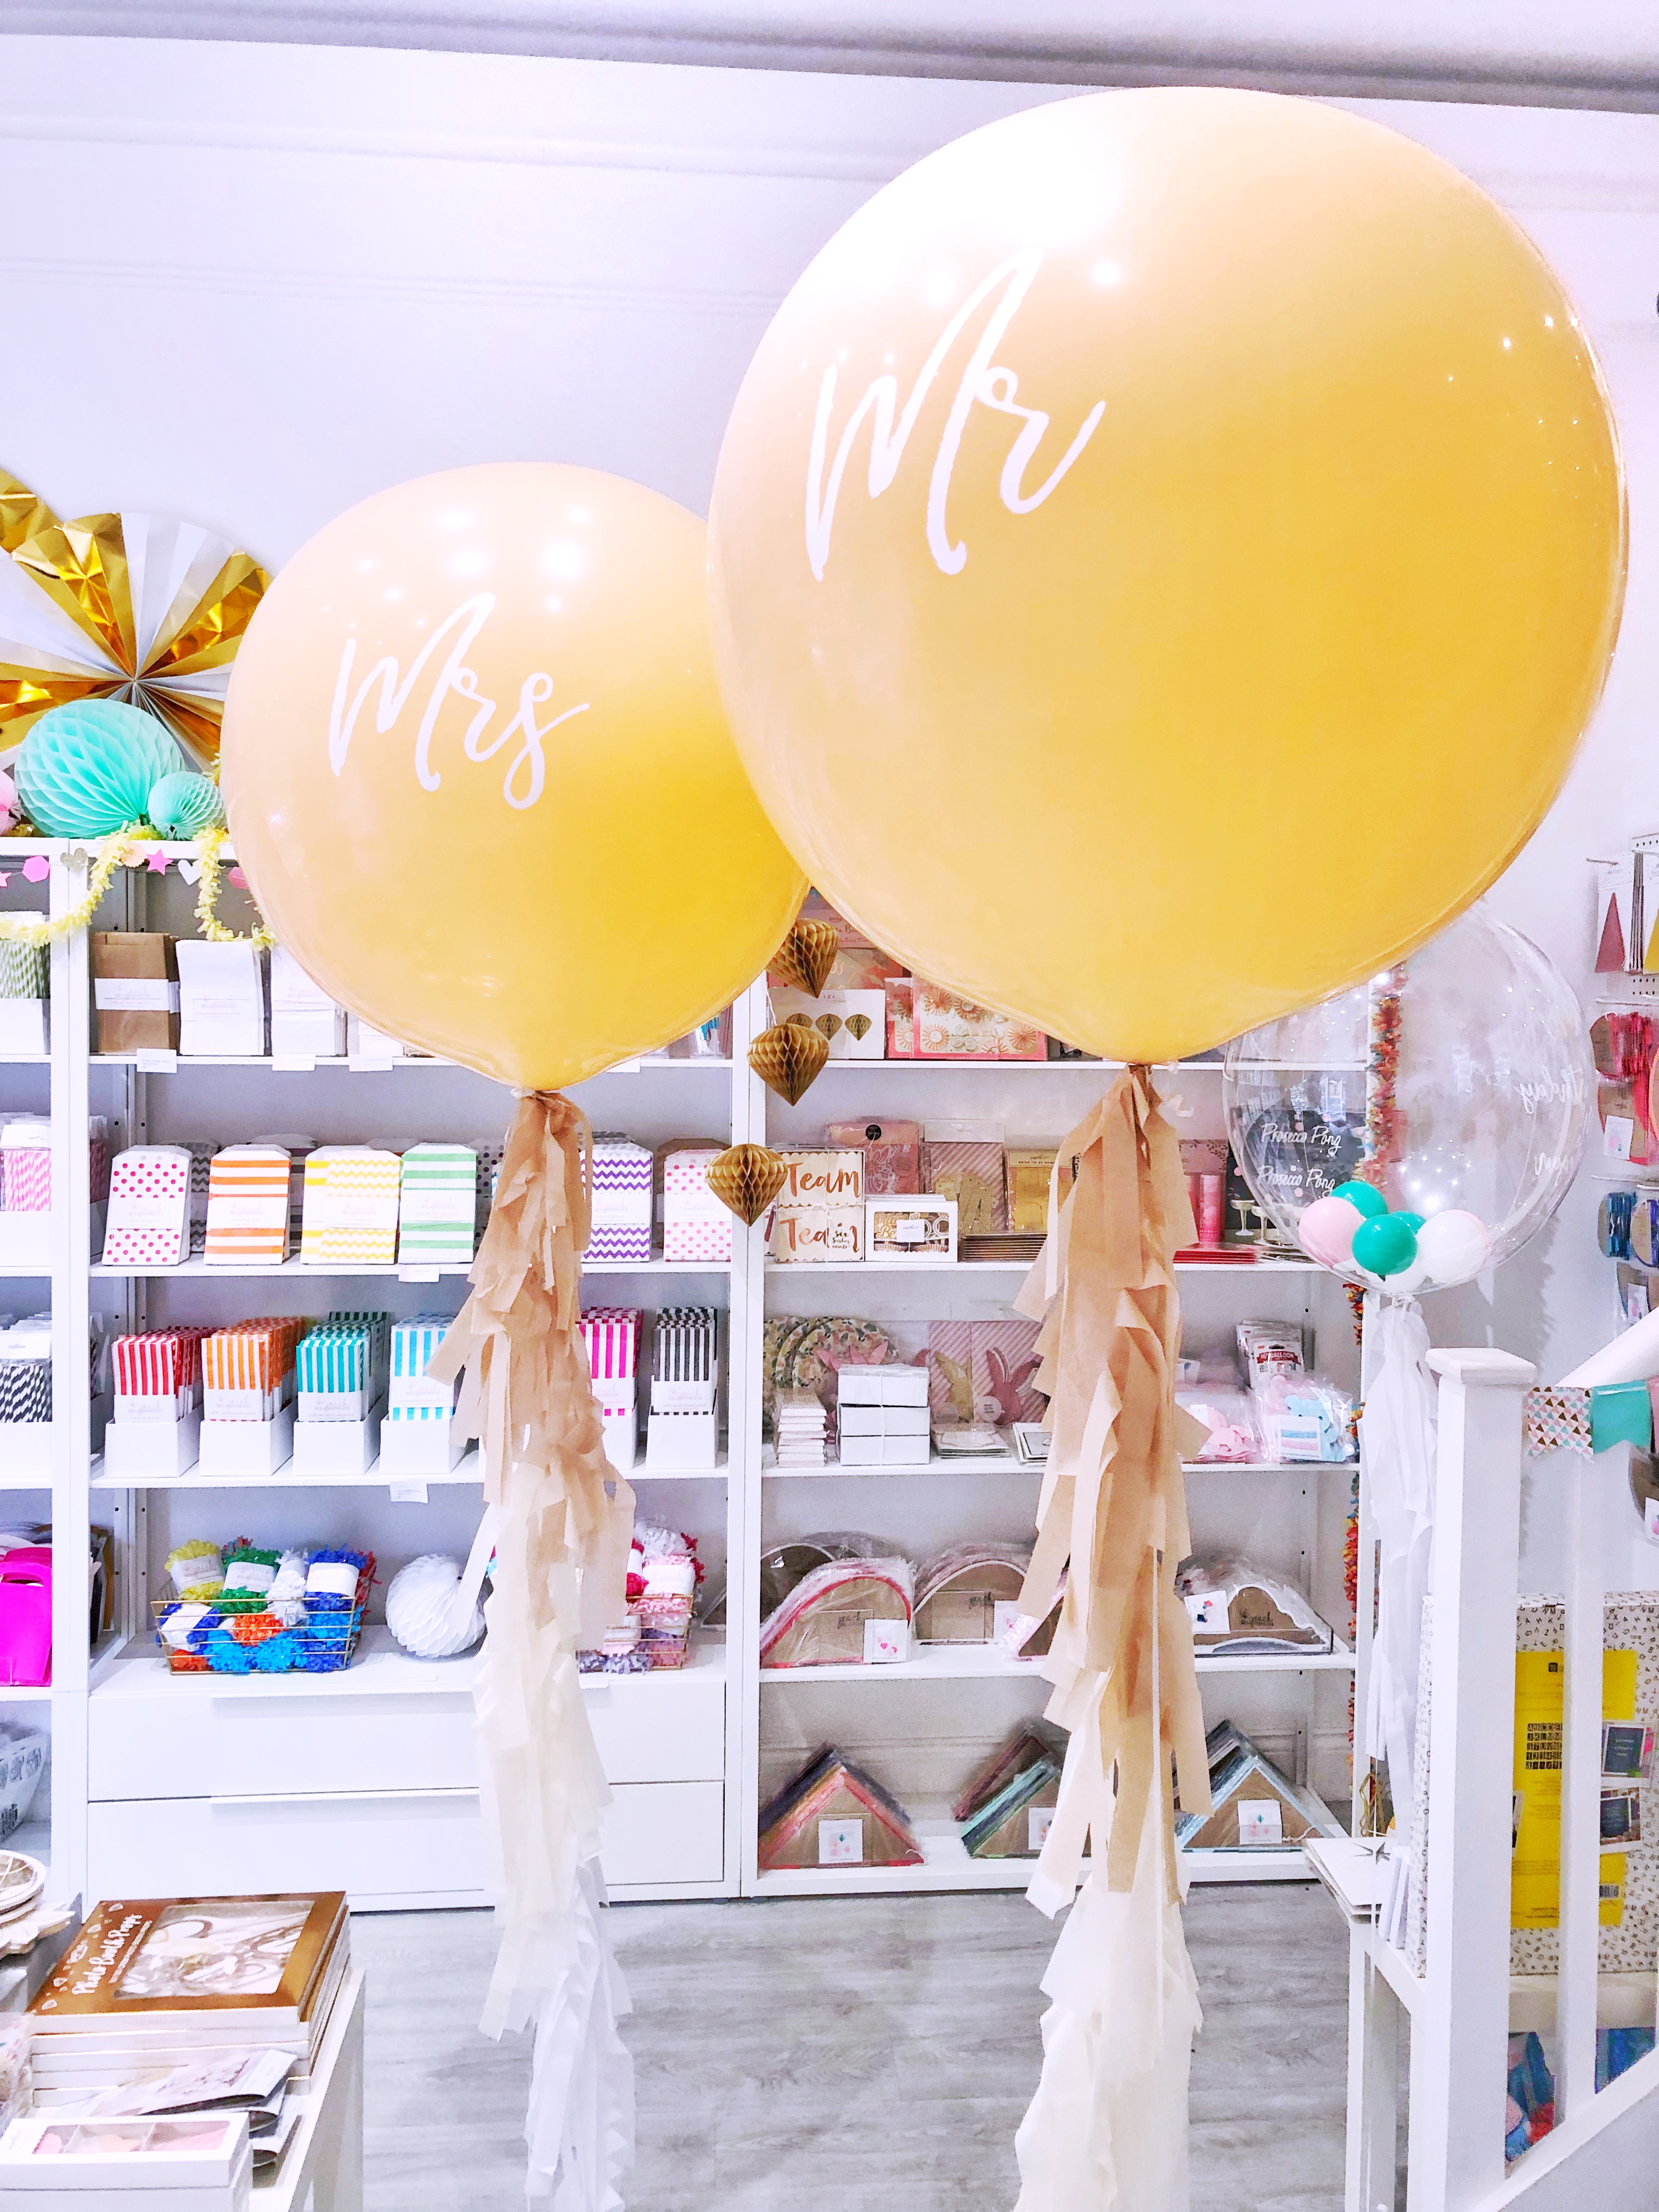 blush-mr-and-mrs-wedding-balloons.jpg